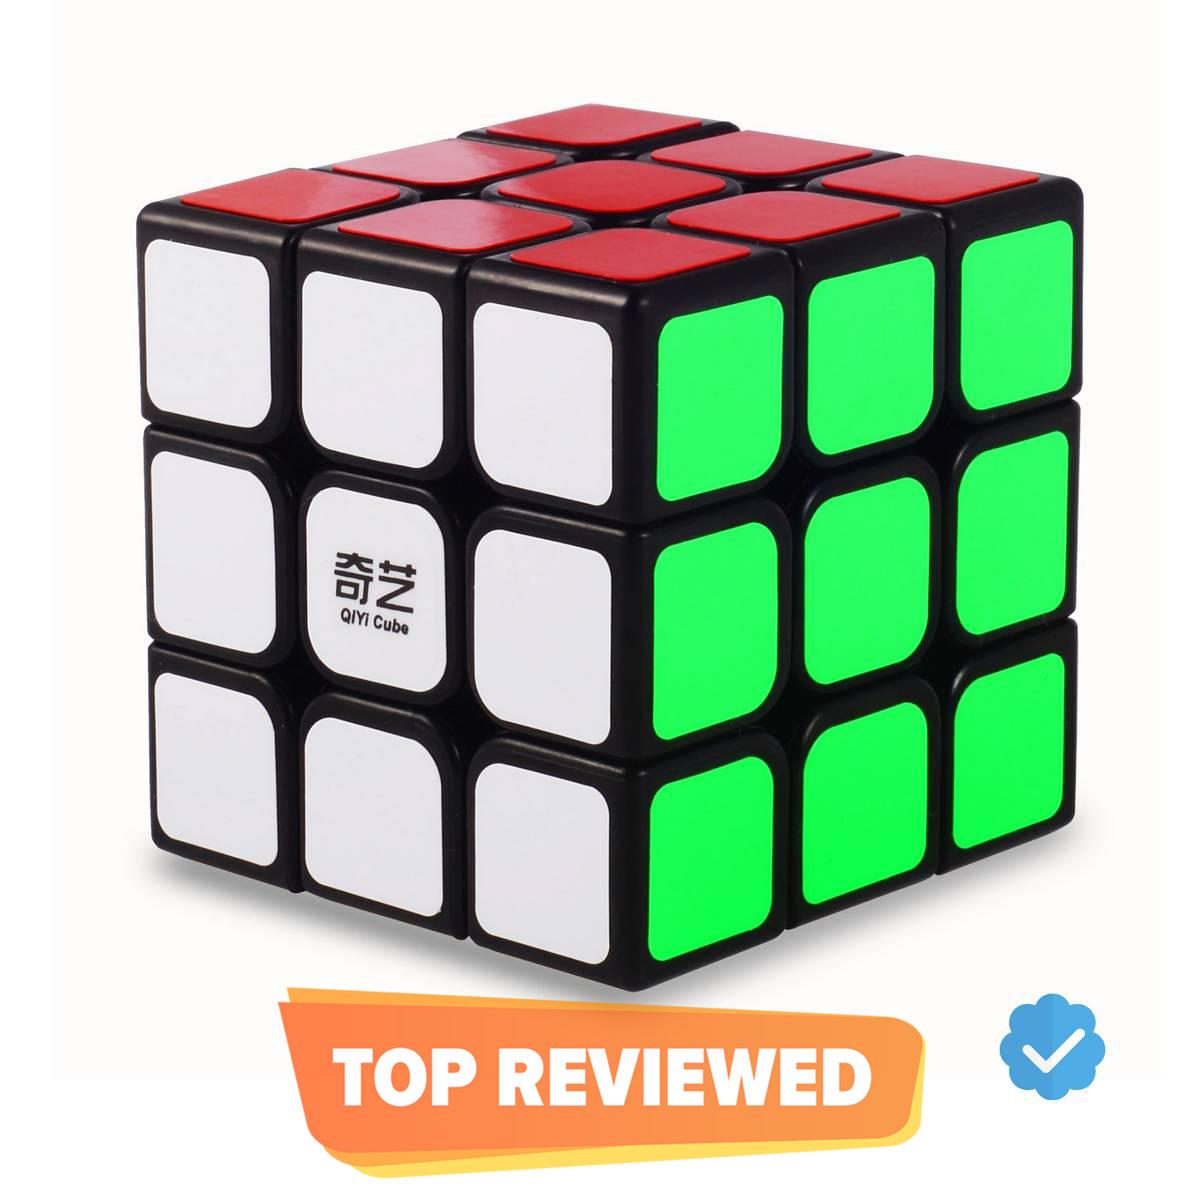 Rubik cube 3x3 Professional Speed Rubik cube puzzle Neo Rubiks Cube, An Rubik cube 3x3 Magic Sticker Education Toys